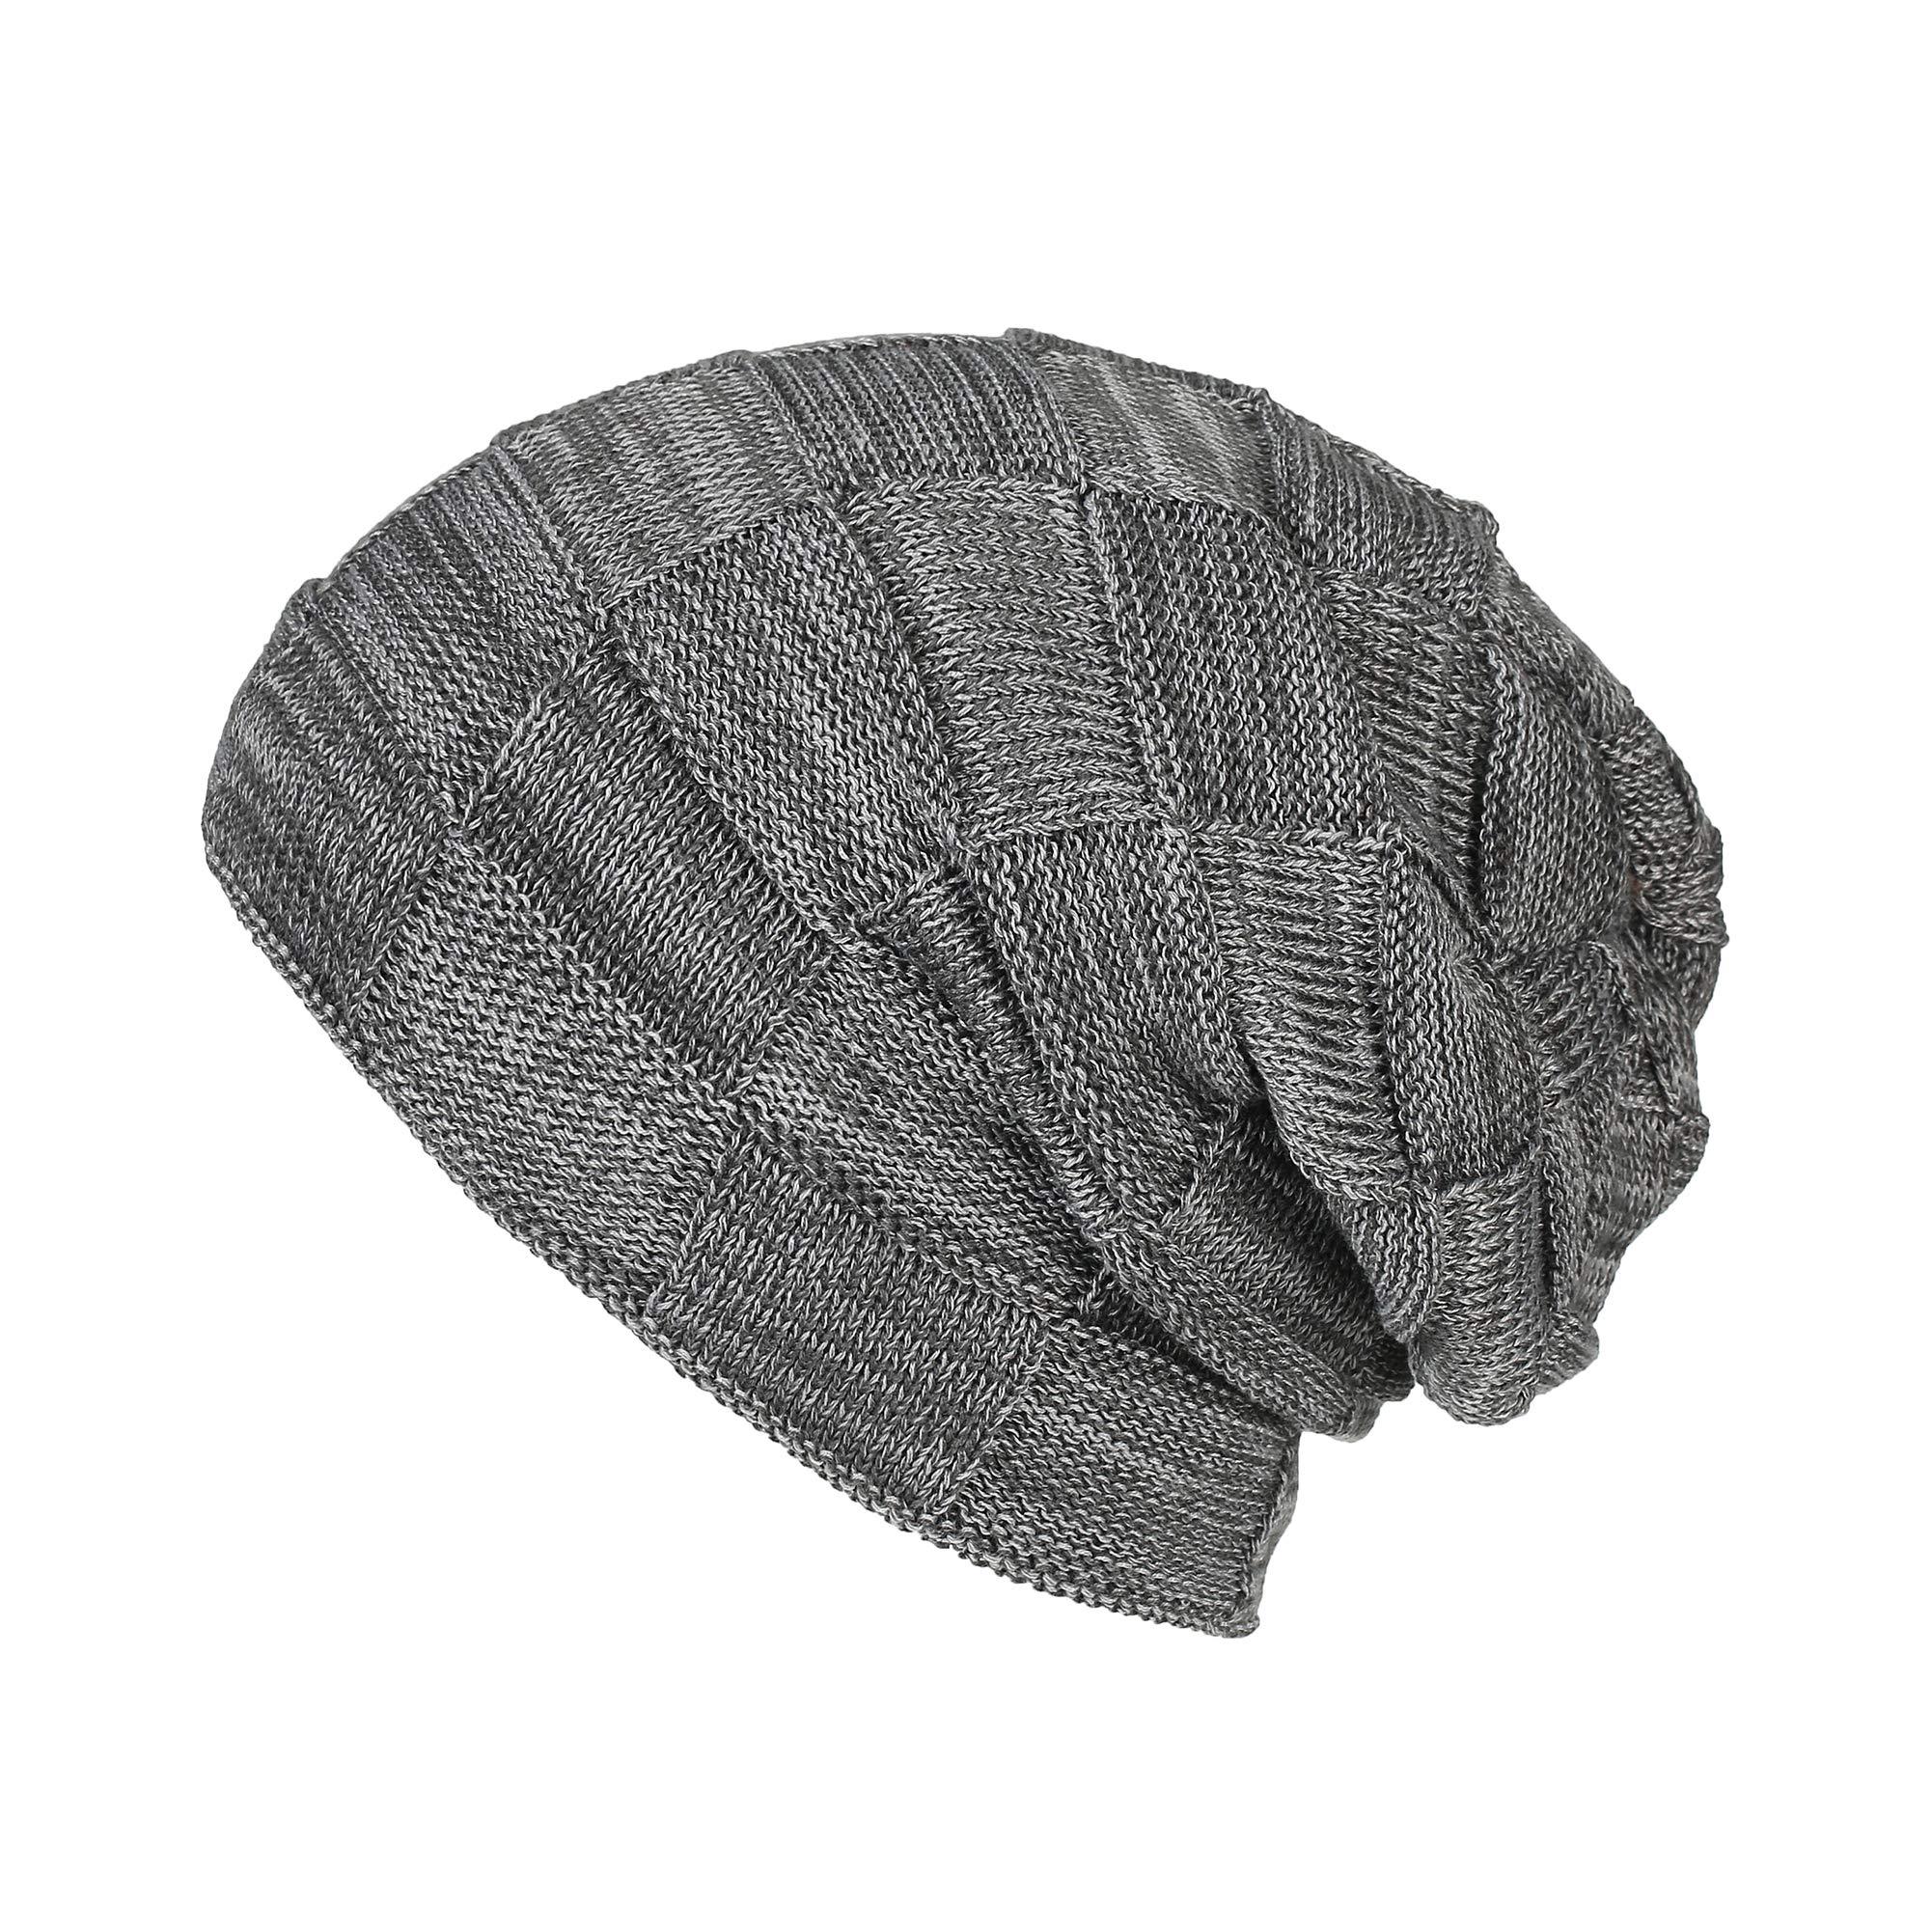 ZaYang Winter Knit Beanie Hat Fleece Lined Warm Soft Stretchy Slouchy Skully Ski Cap for Men & Women (Gray Lattice)